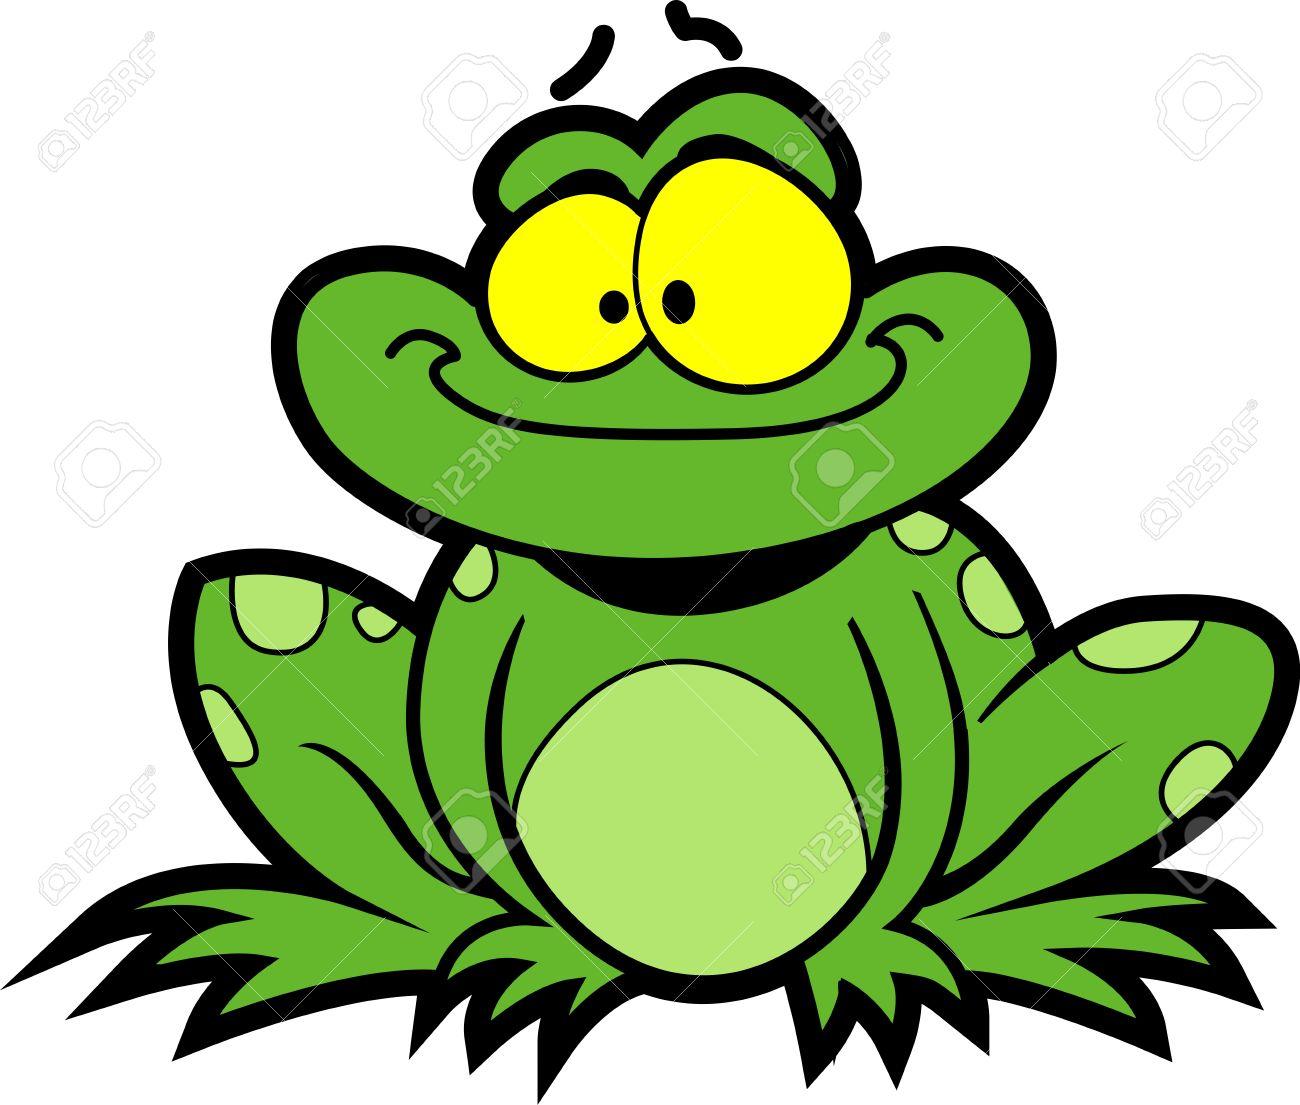 1300x1105 Happy Smiling Cartoon Frog Royalty Free Cliparts, Vectors,